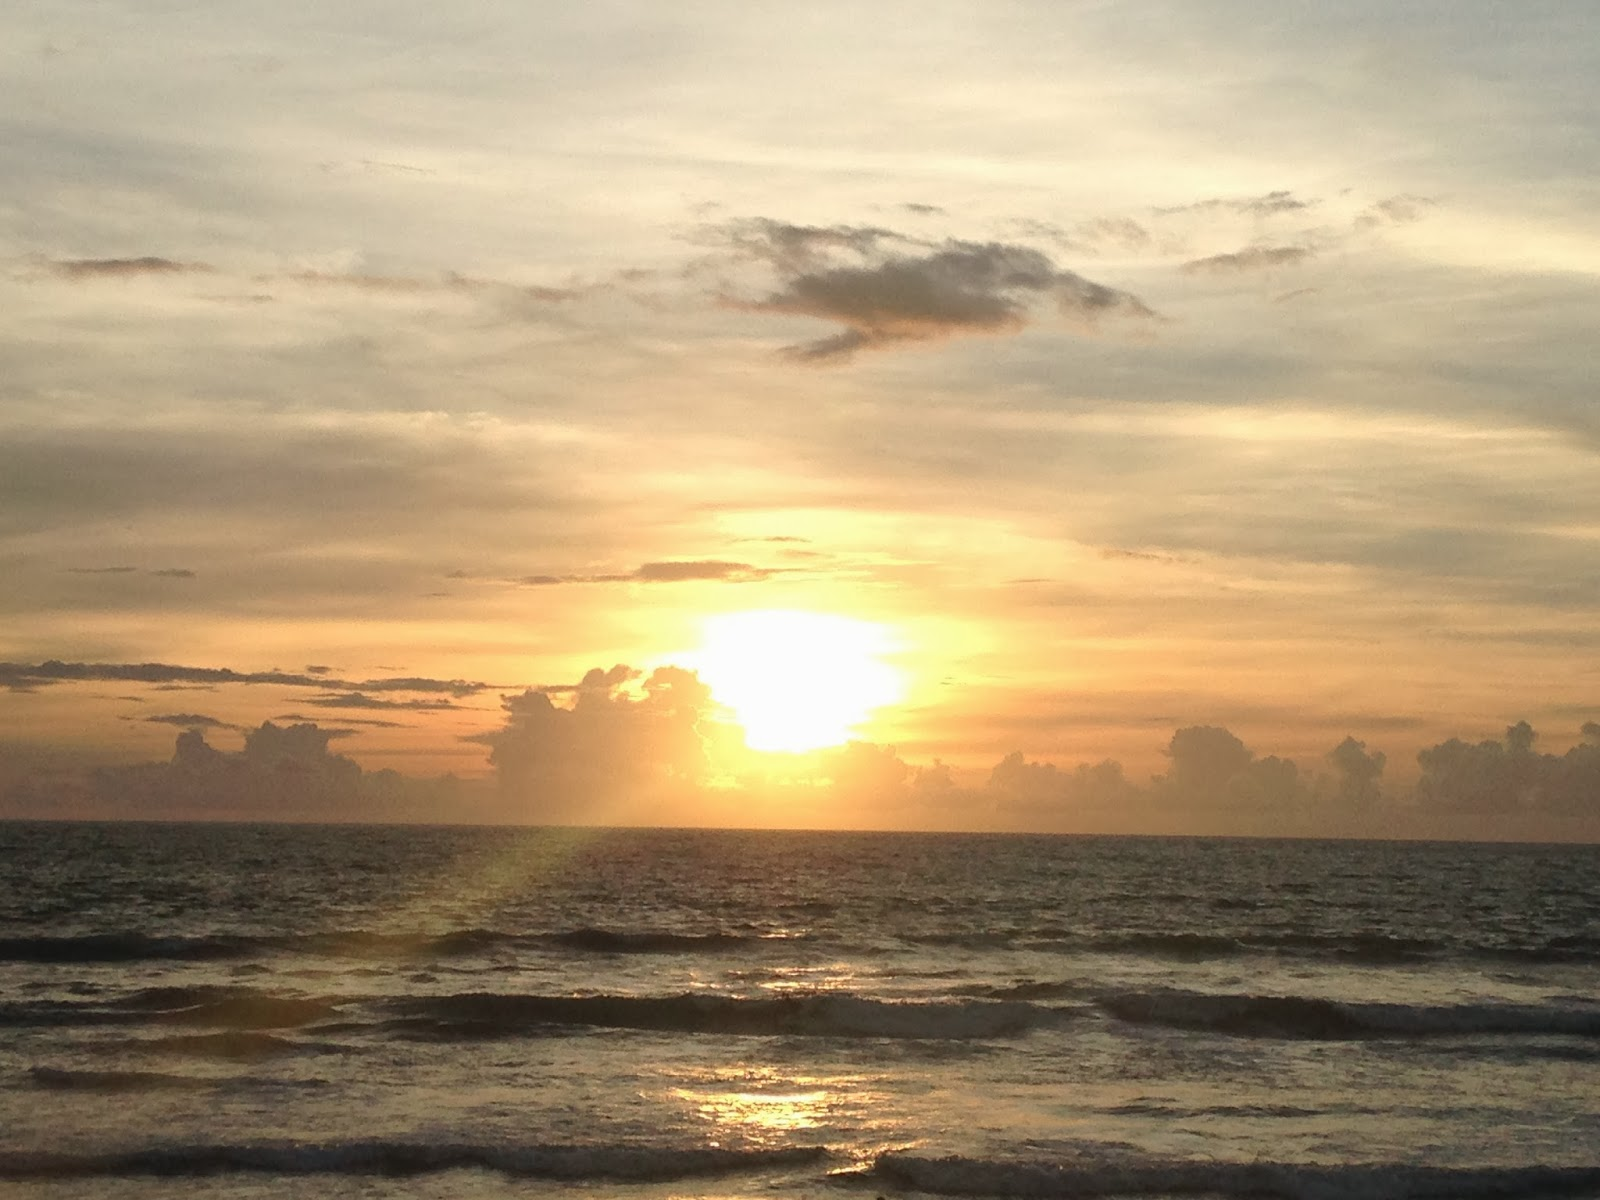 sunset seminyak bali indonesia